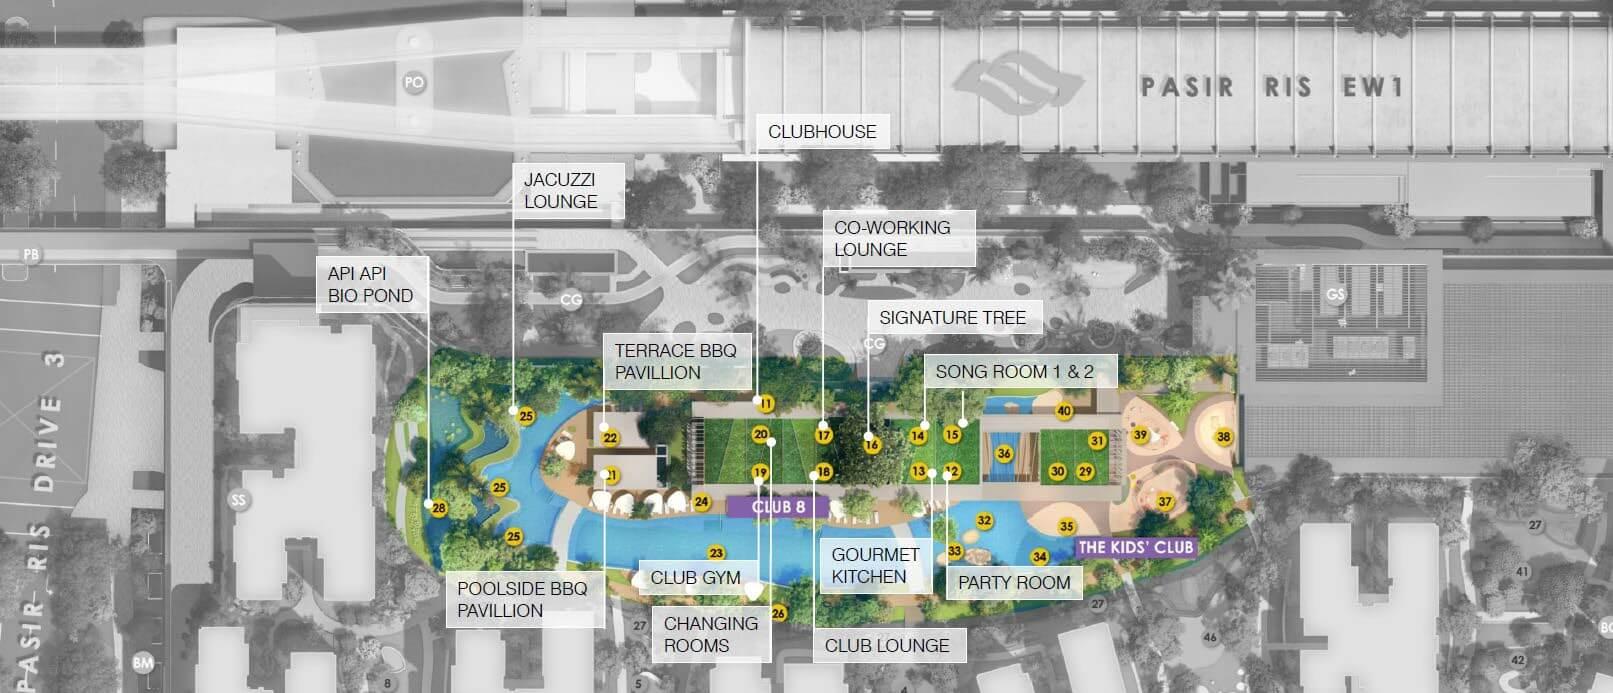 Pasir Ris 8 Site Plan 2